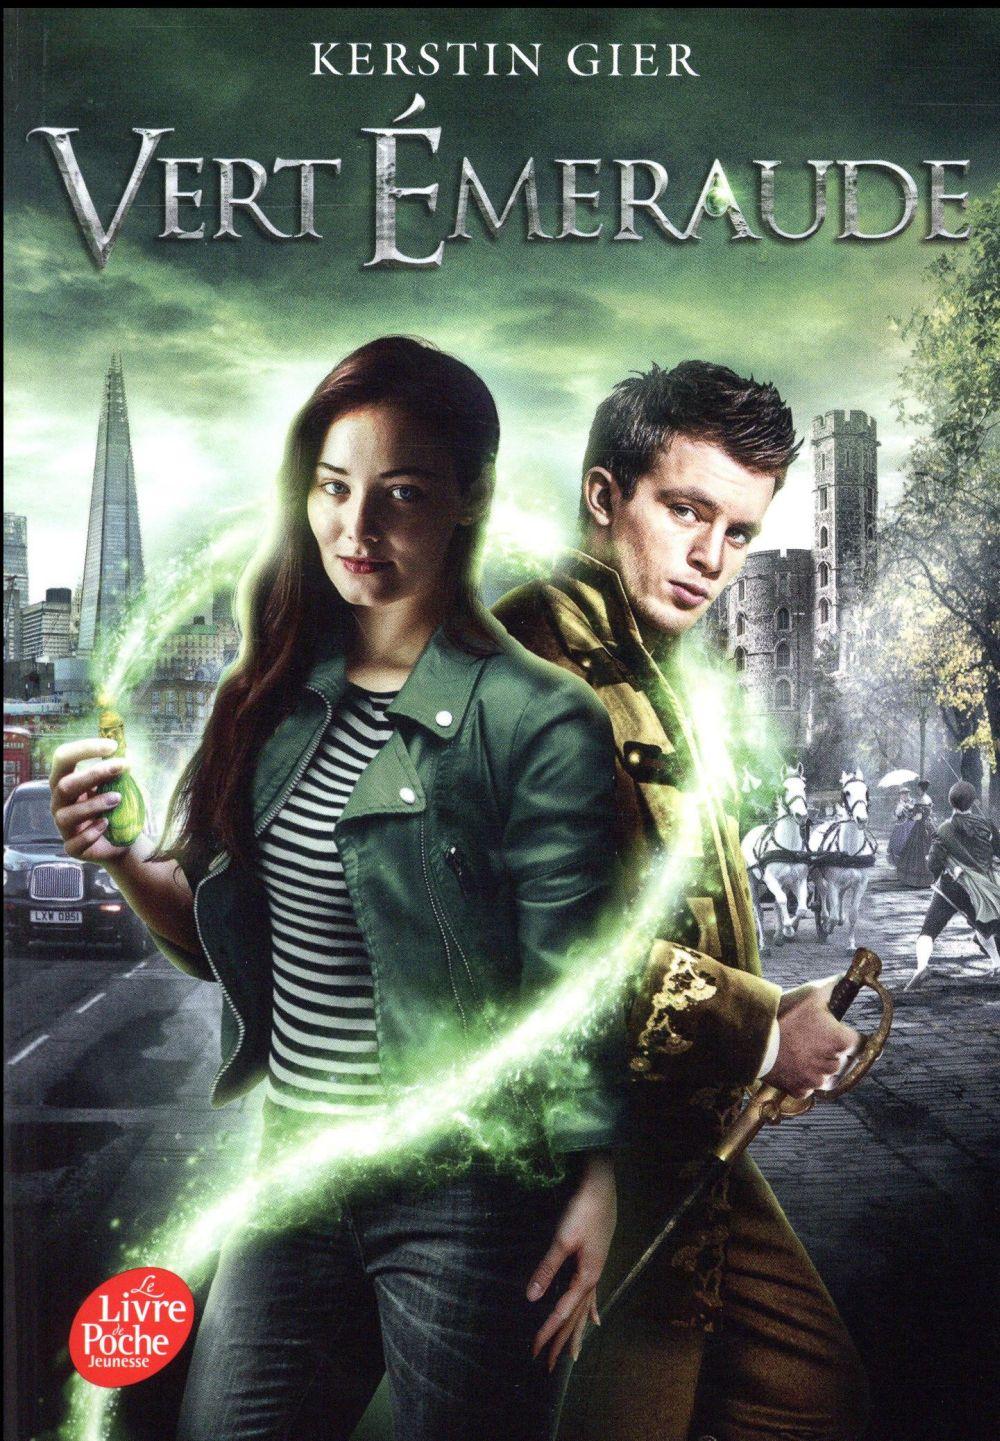 La trilogie des gemmes - vert emeraude - tome 3